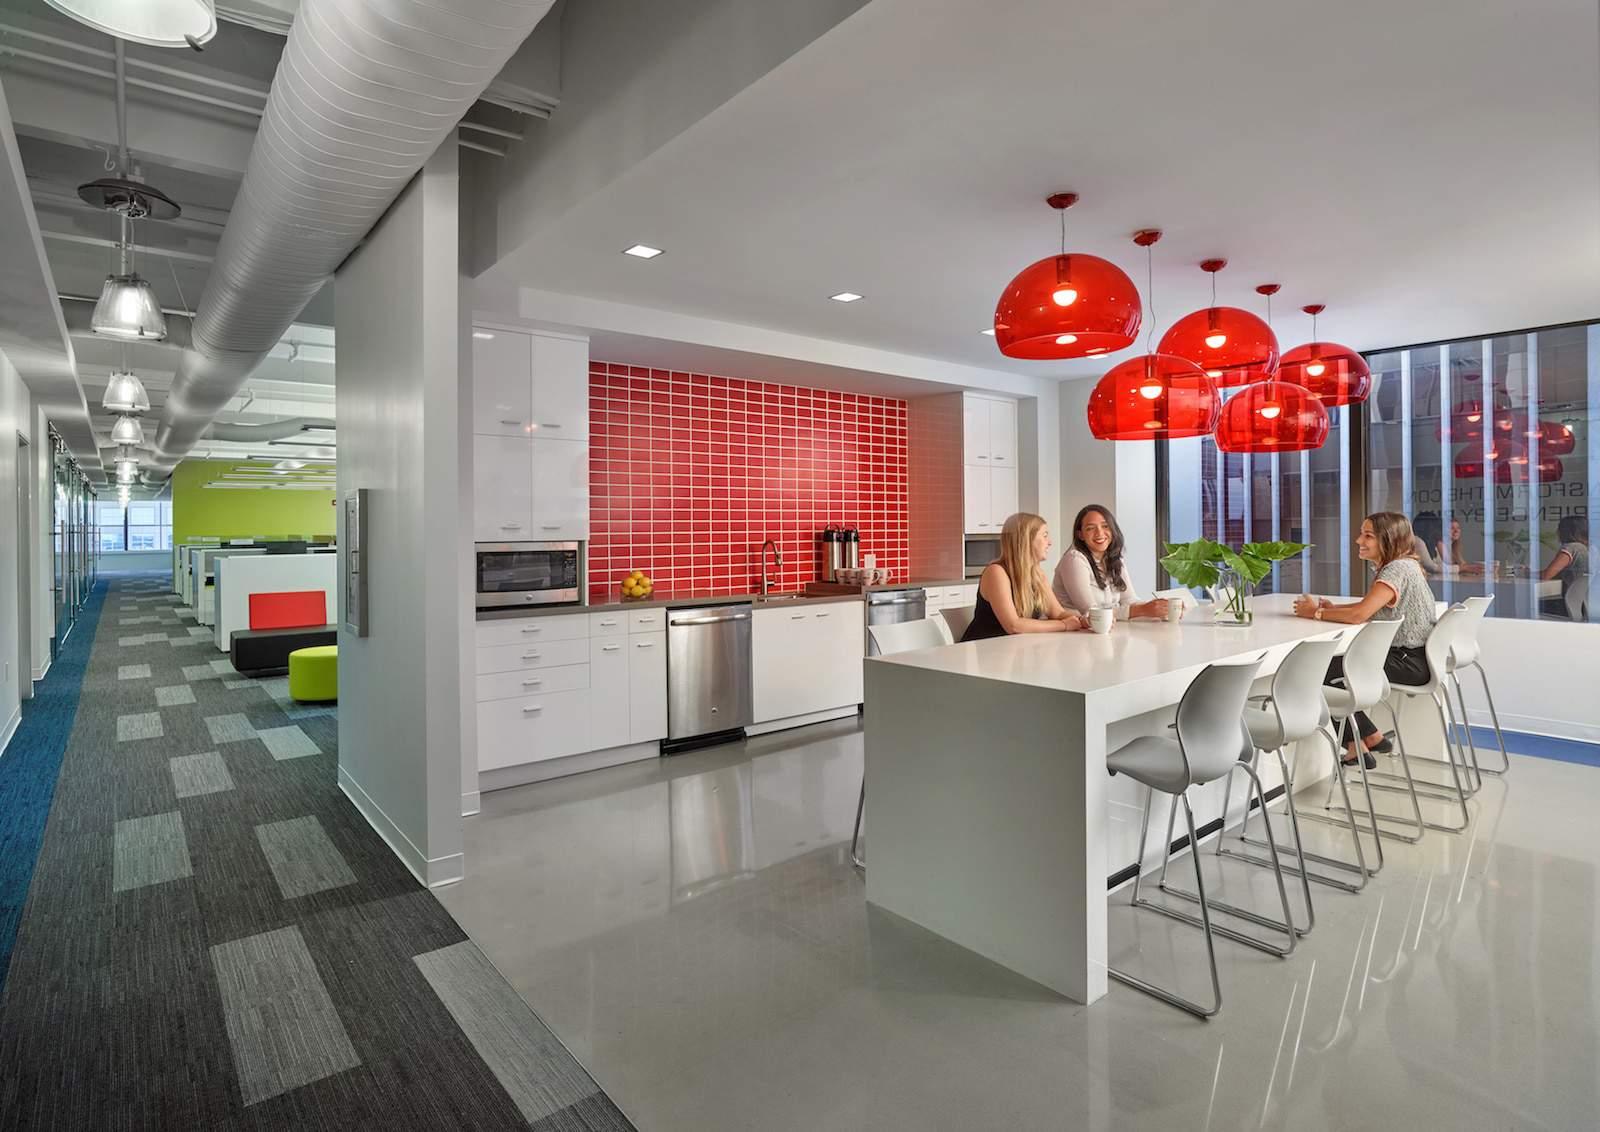 Design Inspiration - Office Kitchen | Grosvenor Workspace Solutions 3